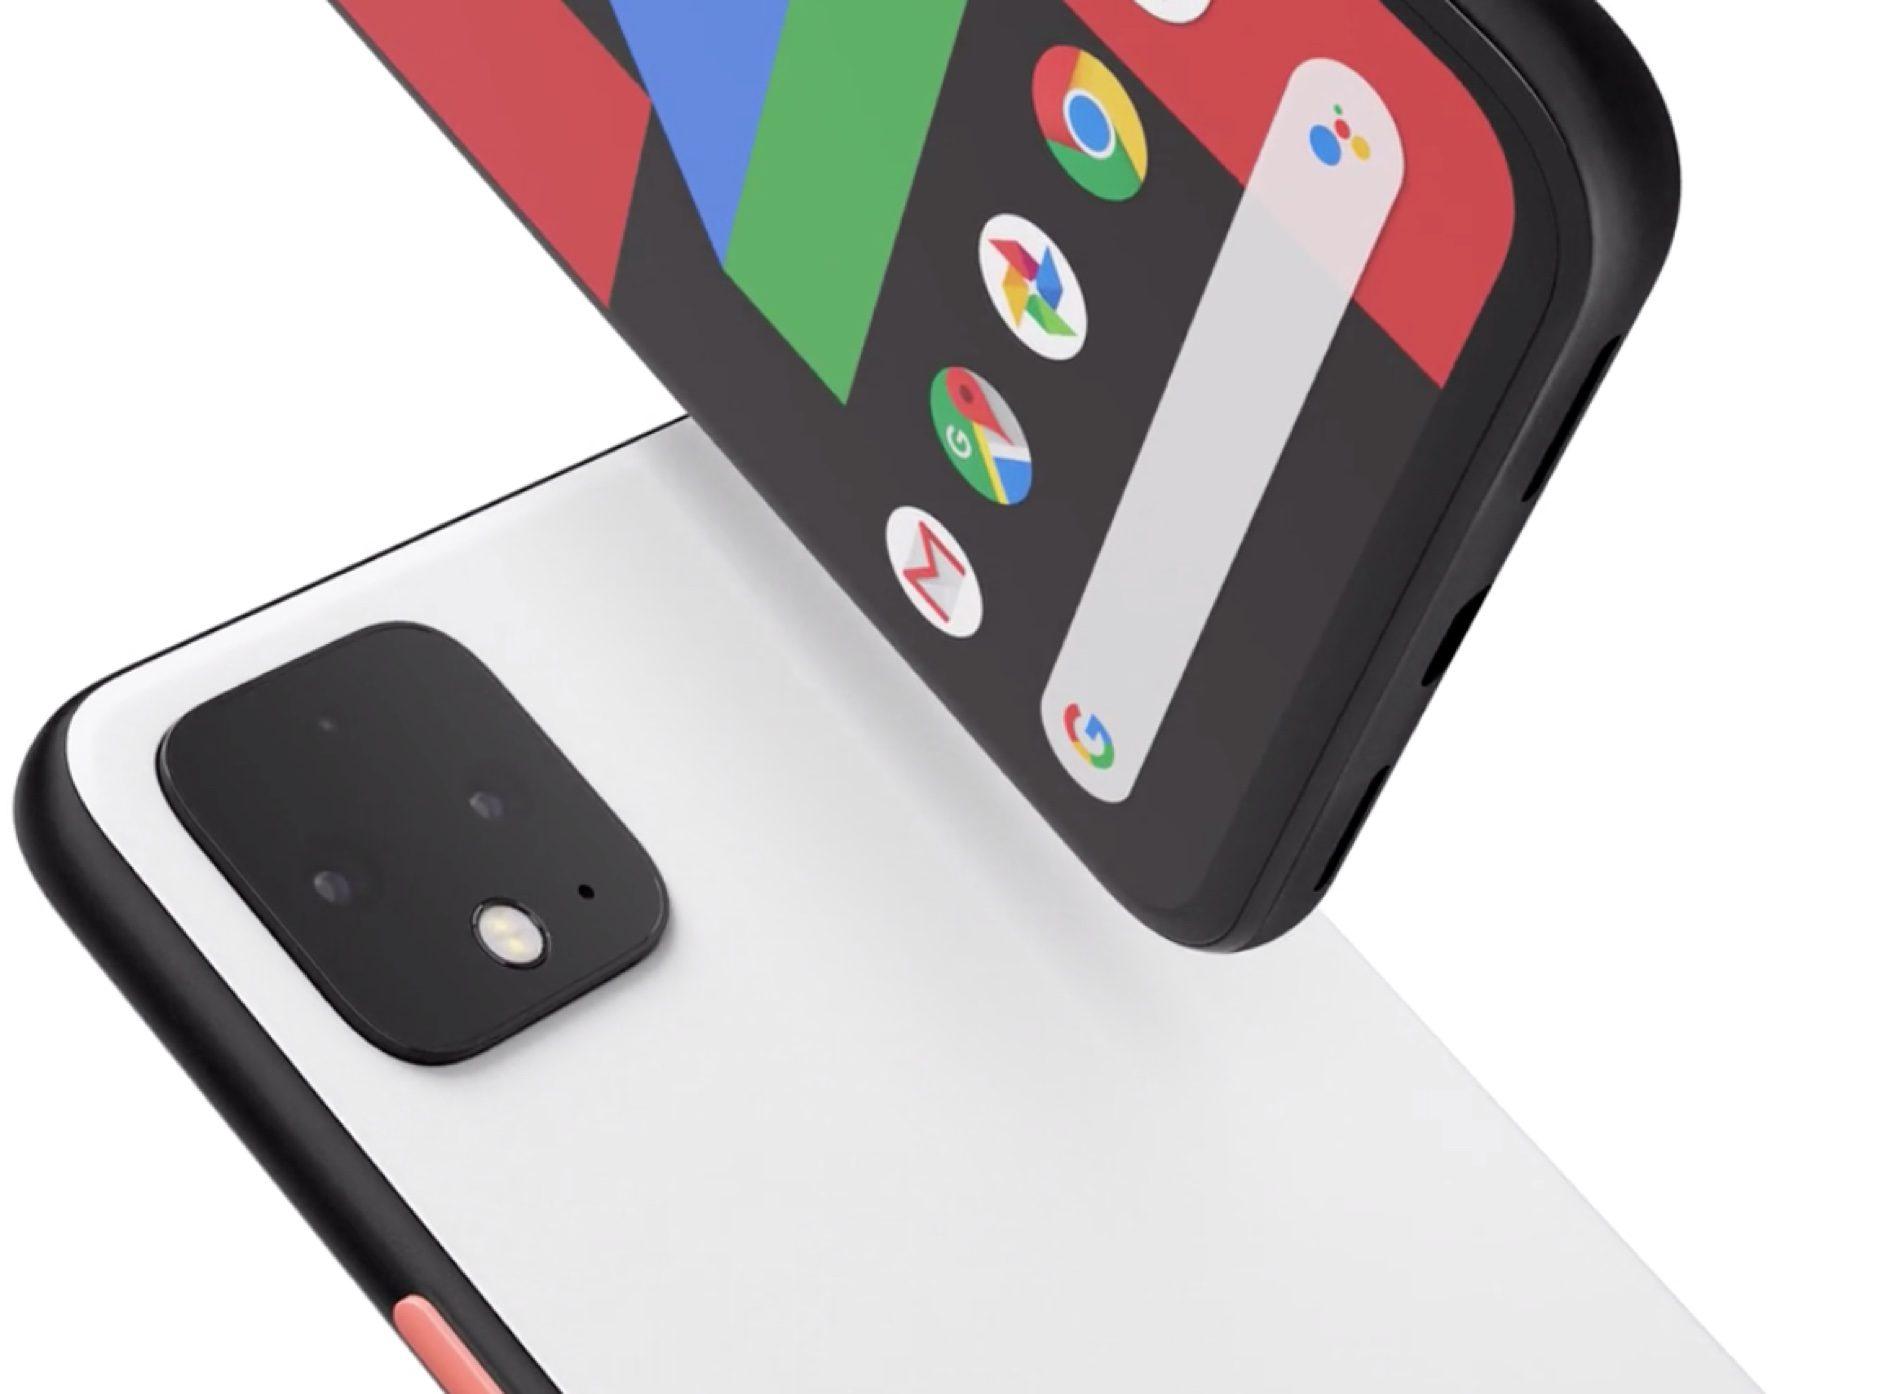 Google Pixel 5: confermata l'unica variante XL con Snapdragon 765G